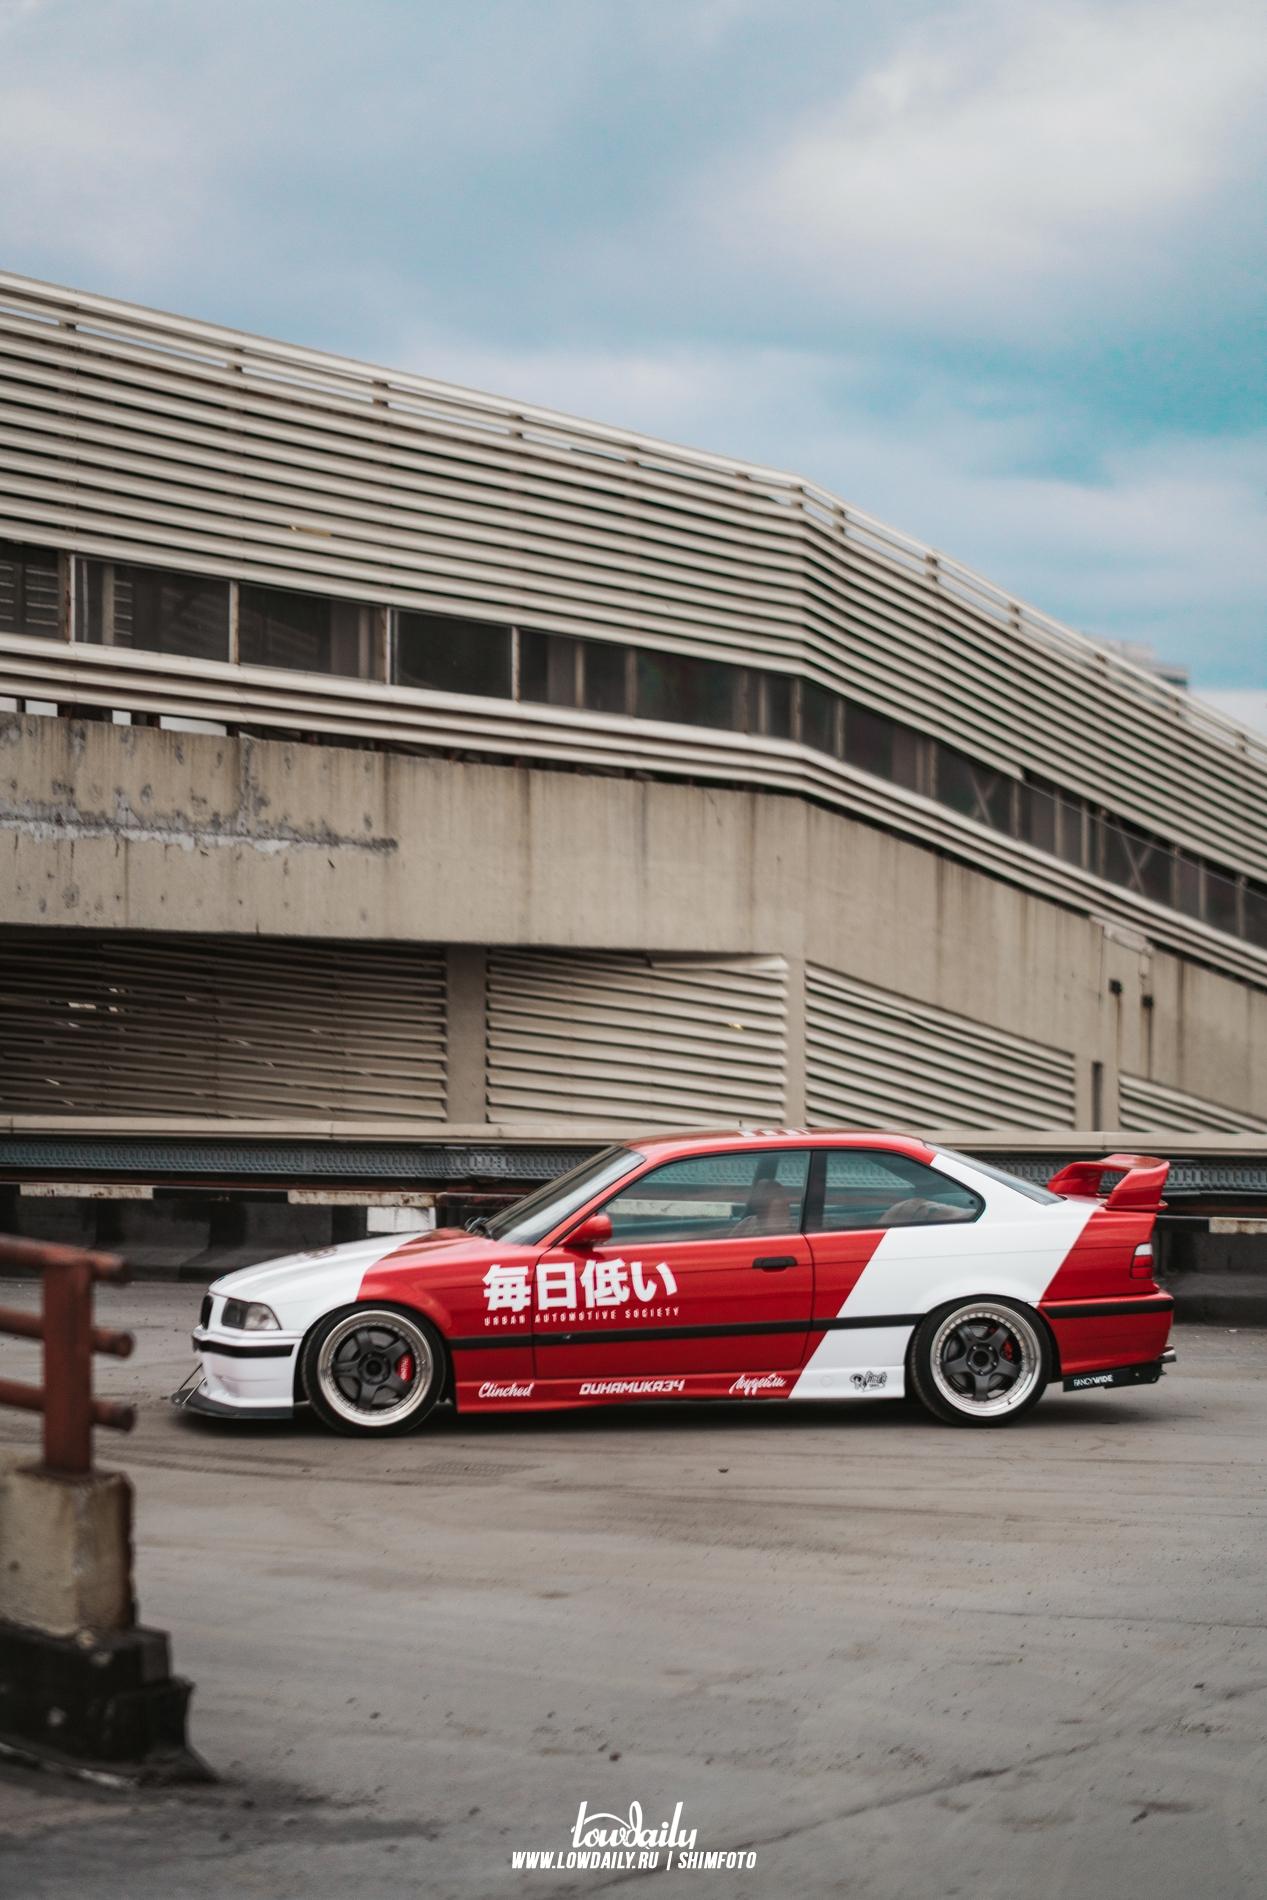 BMW E36 — Twinturbo 2JZ GTE DSC02852